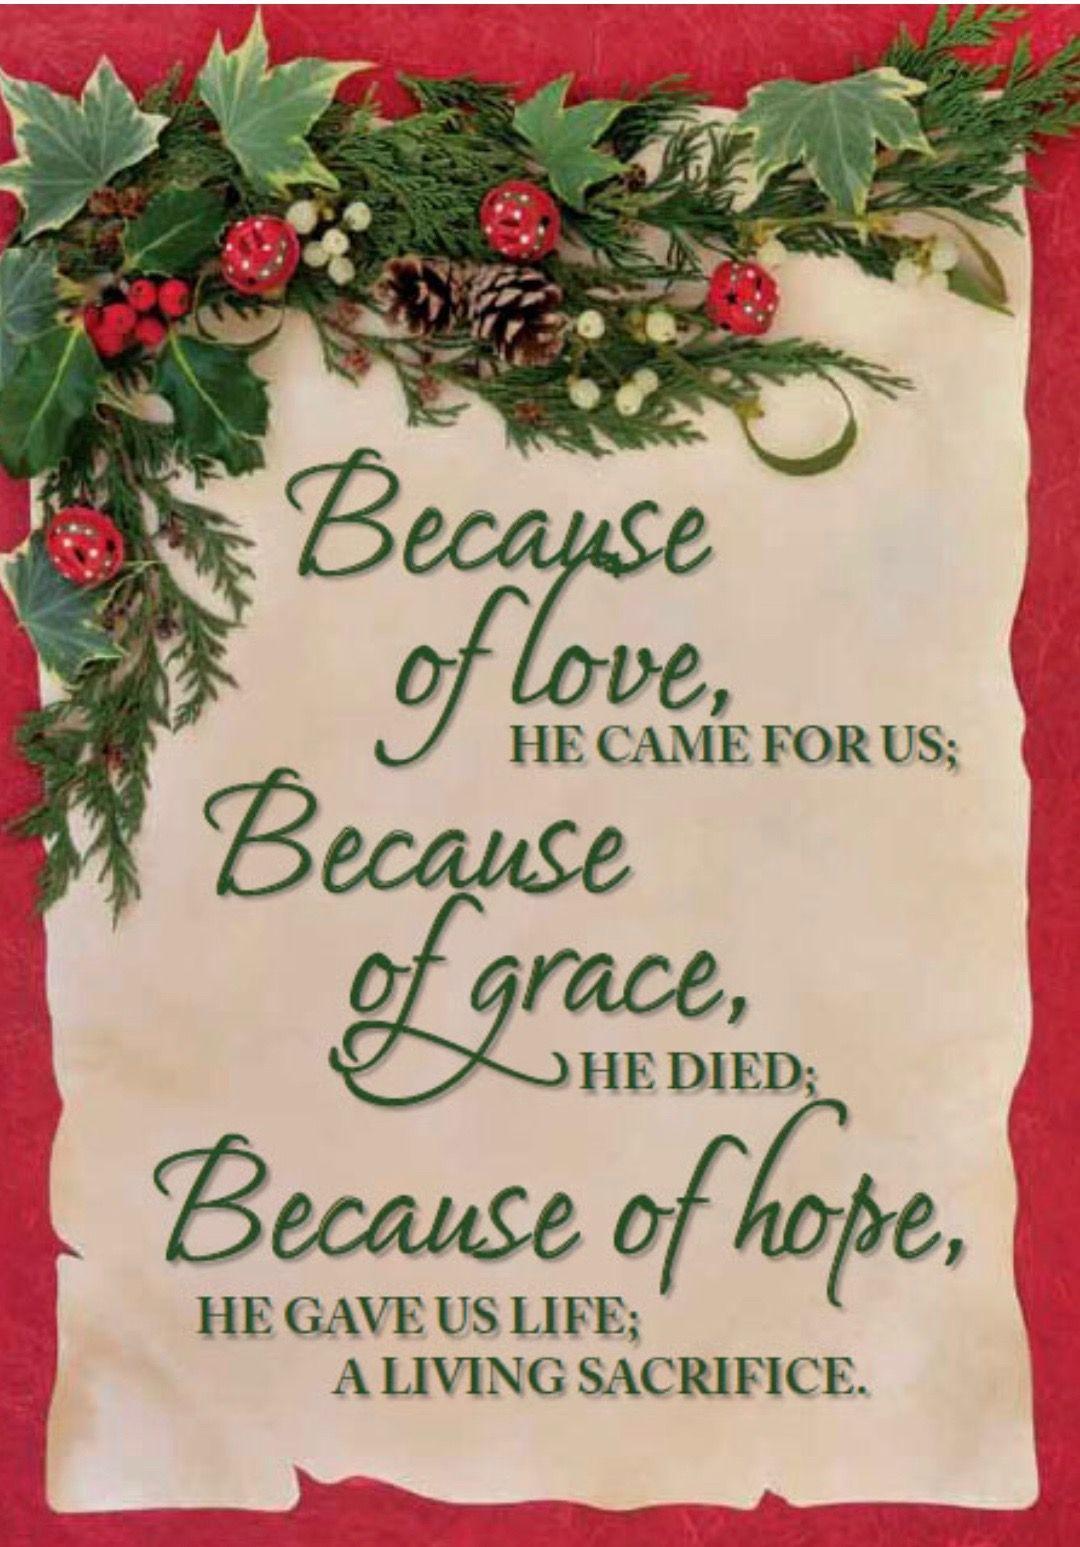 Pin by Roberta Dee on ᑕᕼᖇIᔕTᗰᗩᔕ Christmas verses